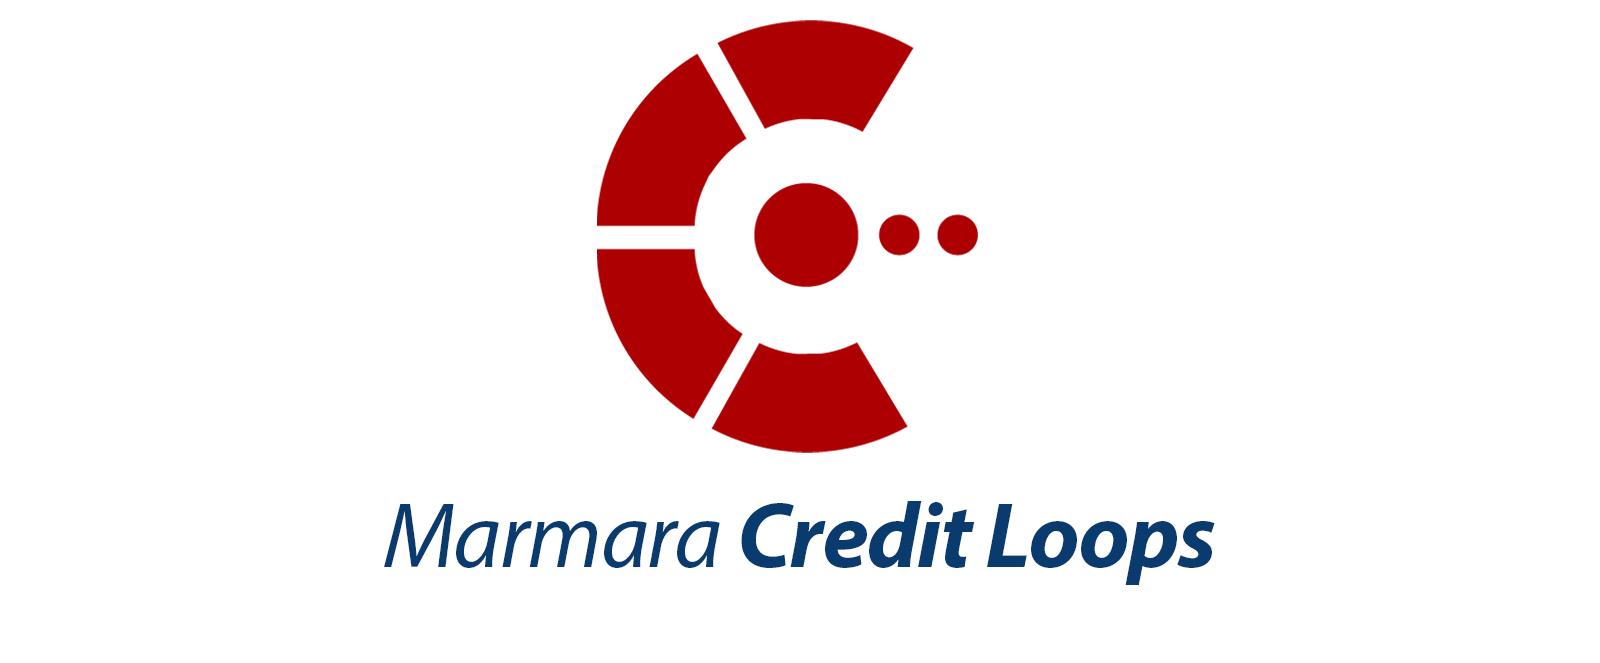 MarmaraCreditLoops Logo